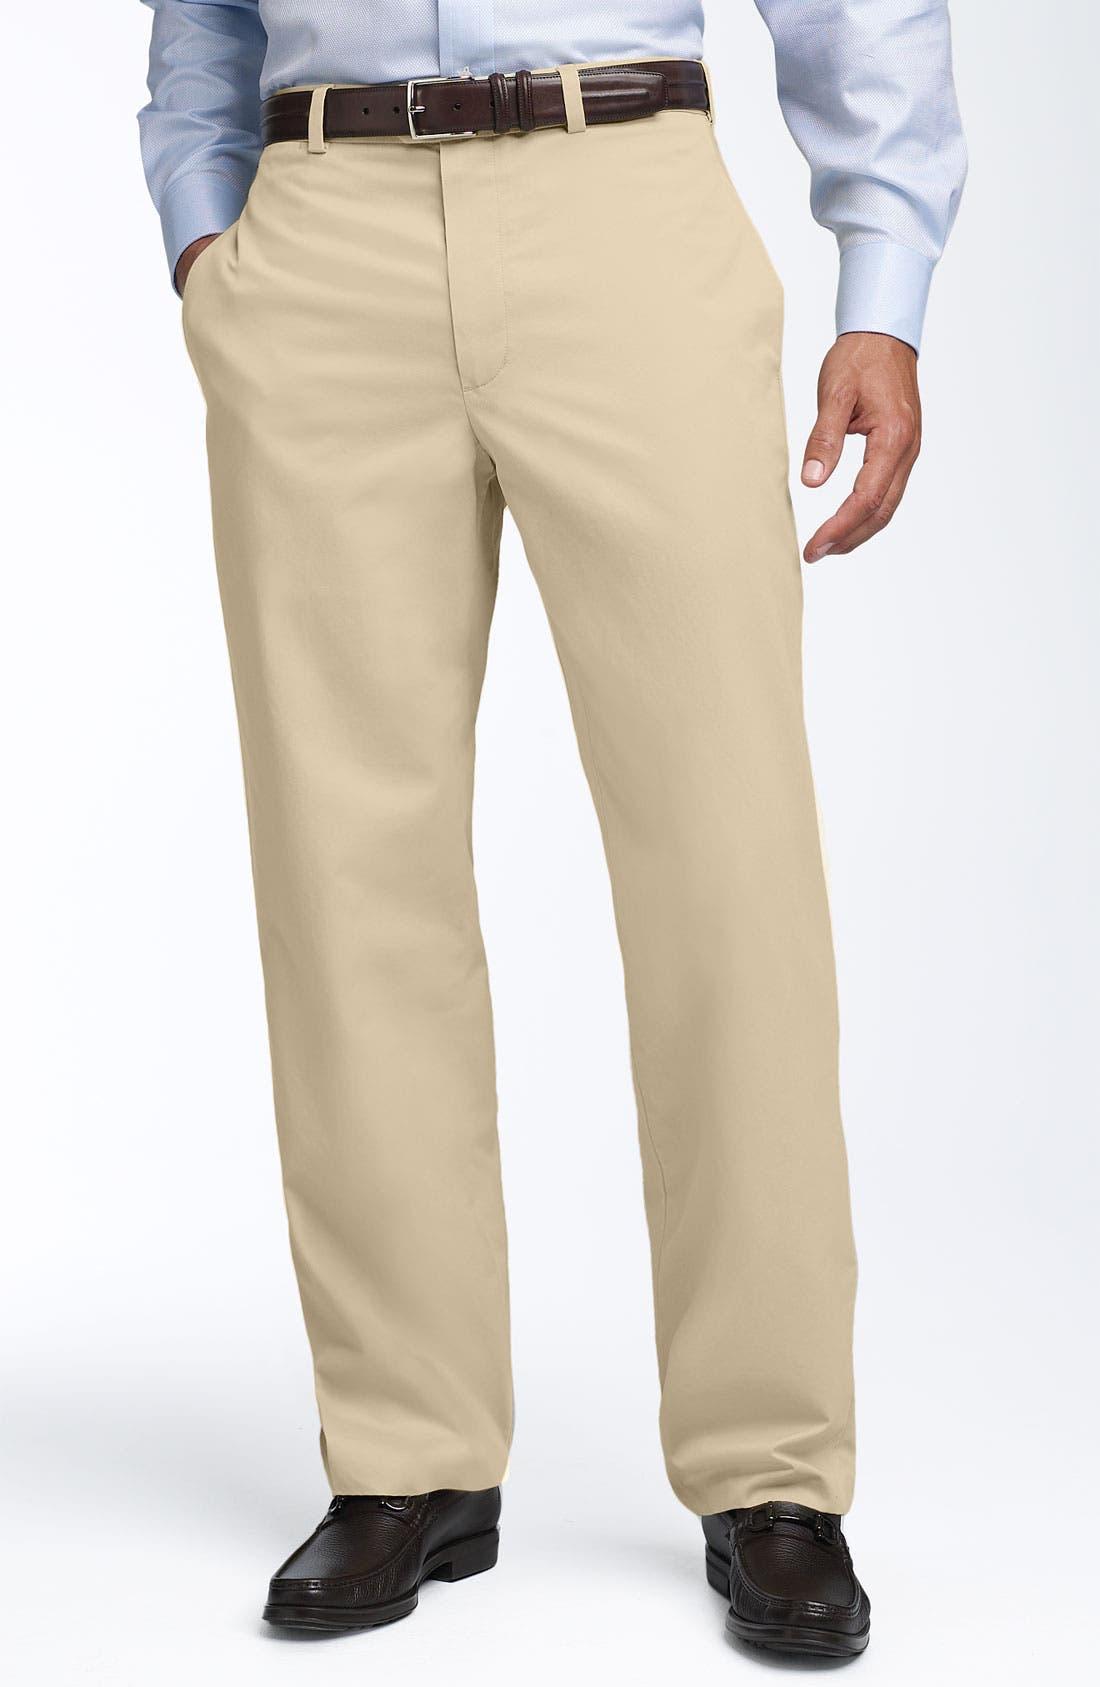 Alternate Image 1 Selected - John W. Nordstrom® Smartcare™ Flat Front Supima® Cotton Pants